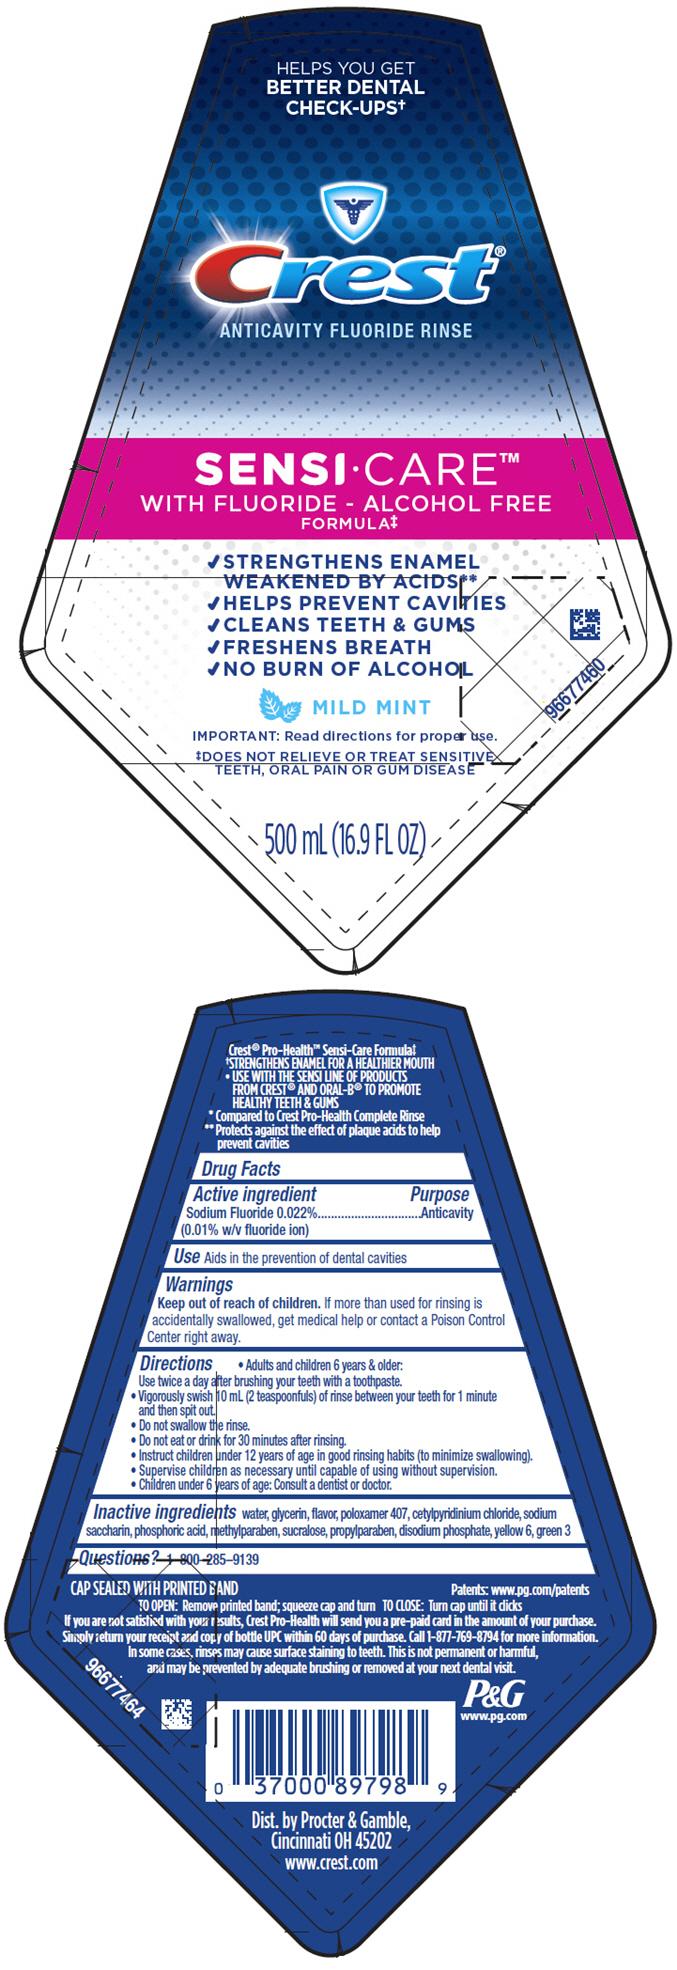 Crest Sensi-care (Sodium Fluoride) Rinse [Procter & Gamble Manufacturing Company]